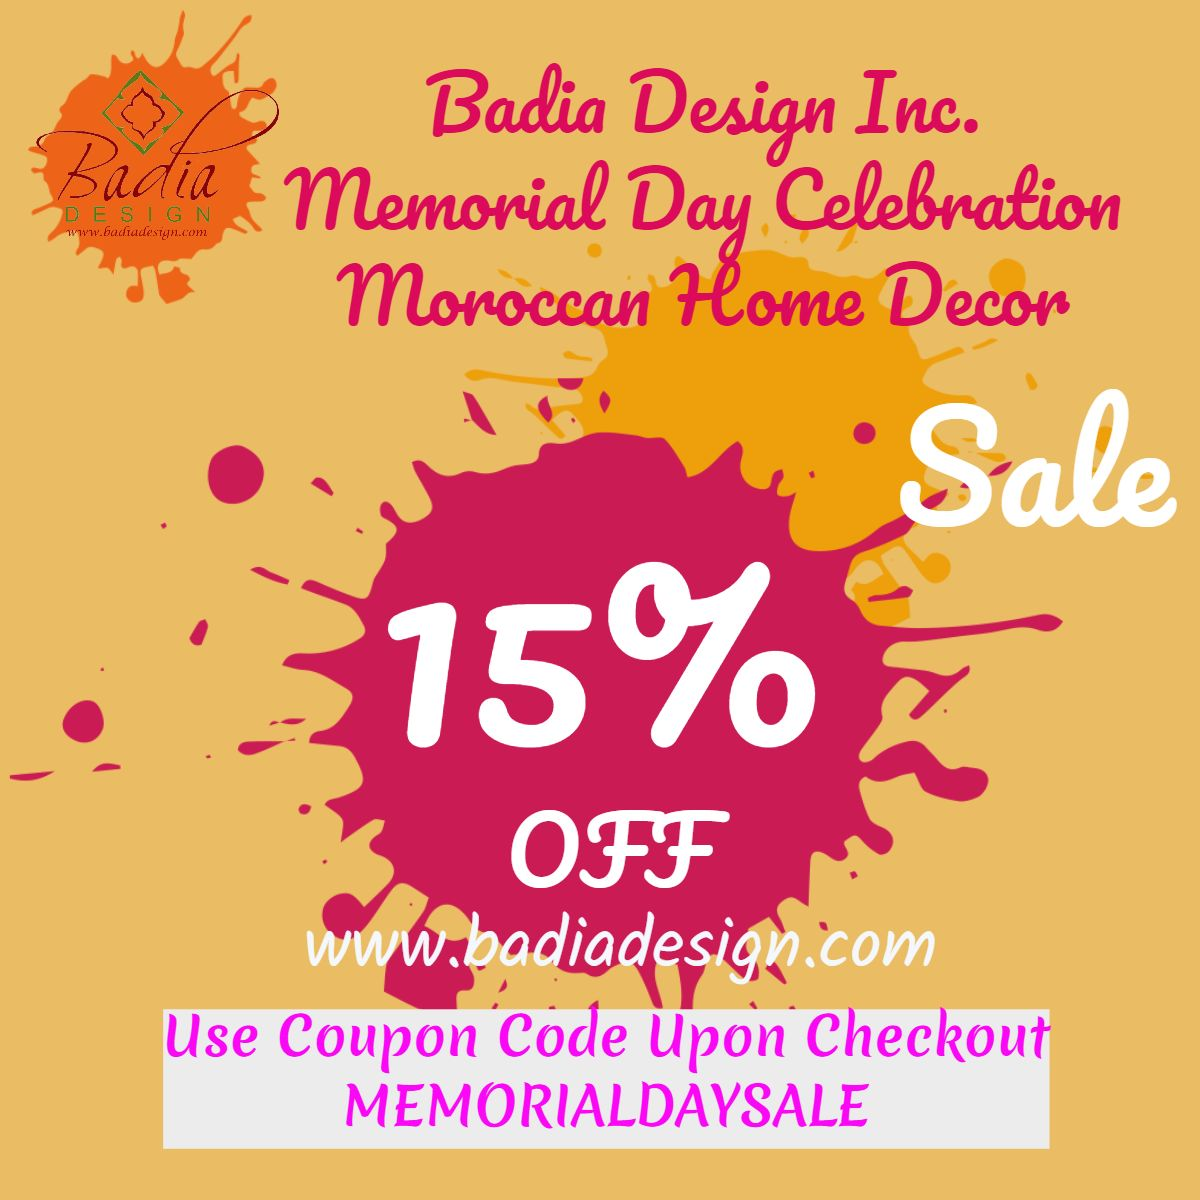 memorial-day-sale-2019.jpeg